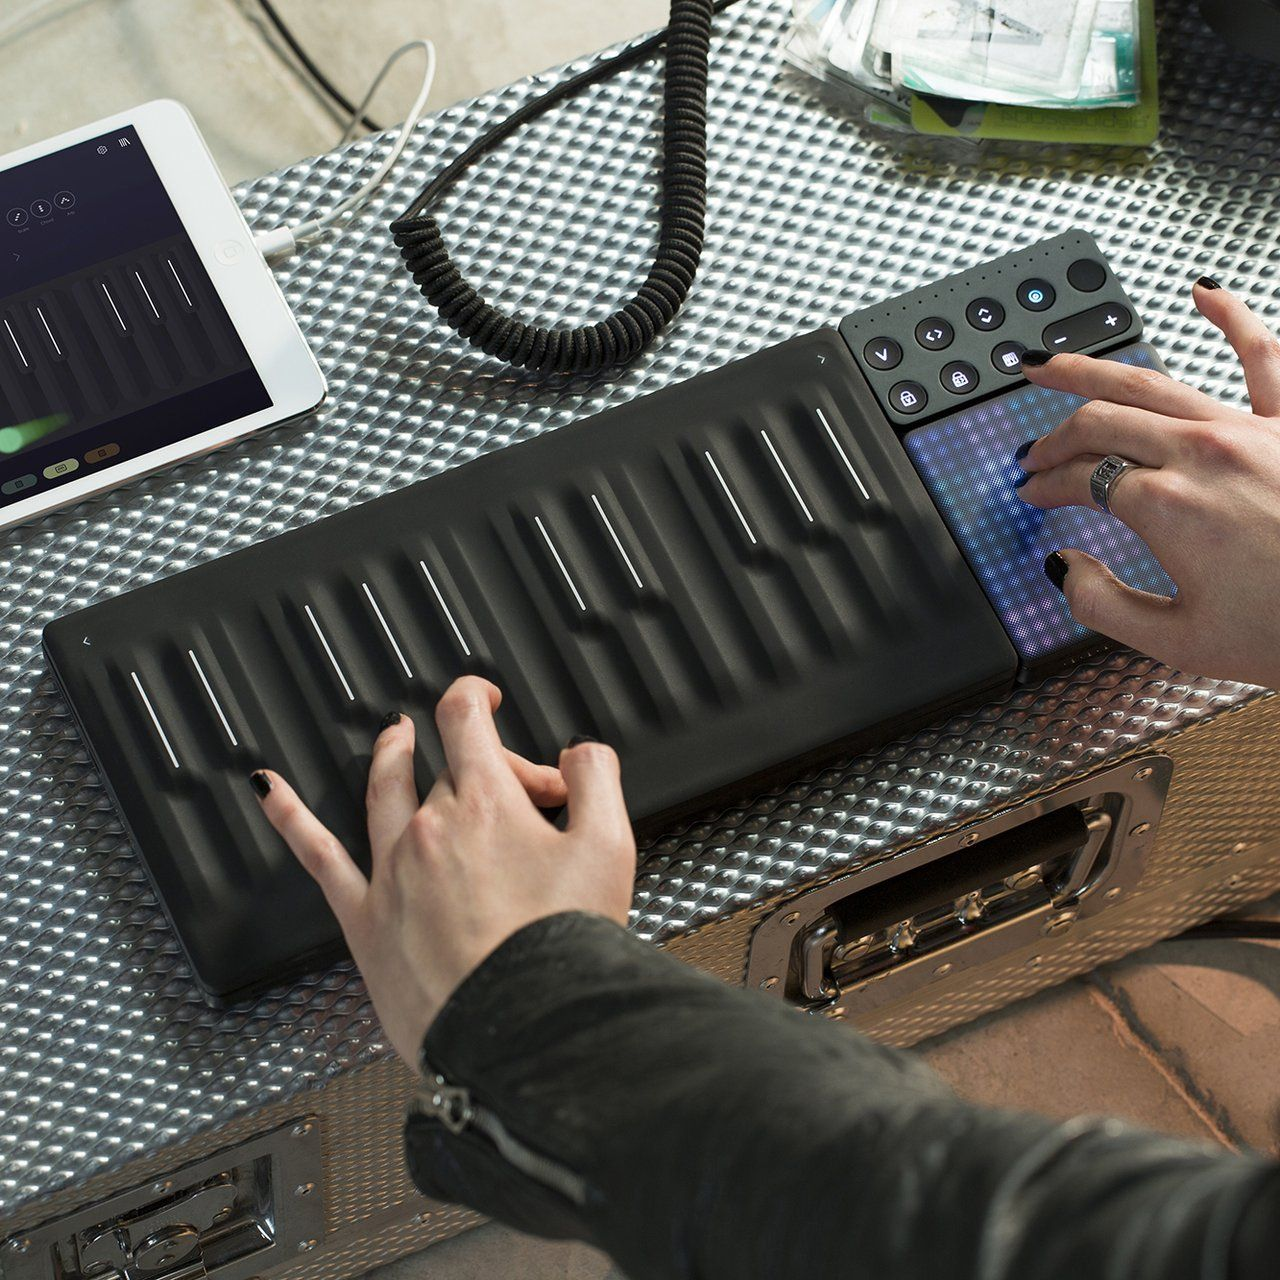 Roli Seaboard Block Petagadget Portable Music Music Keyboard Synthesizer